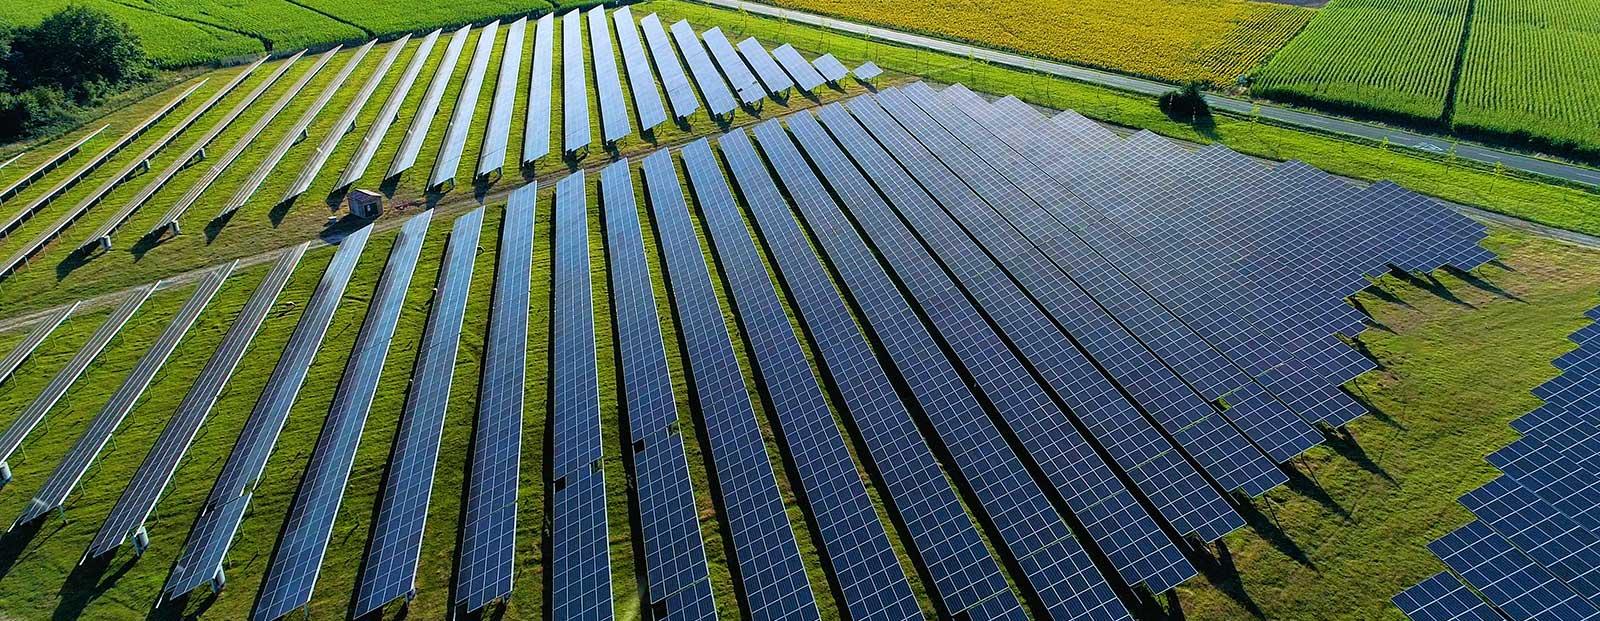 Regenerative Energie